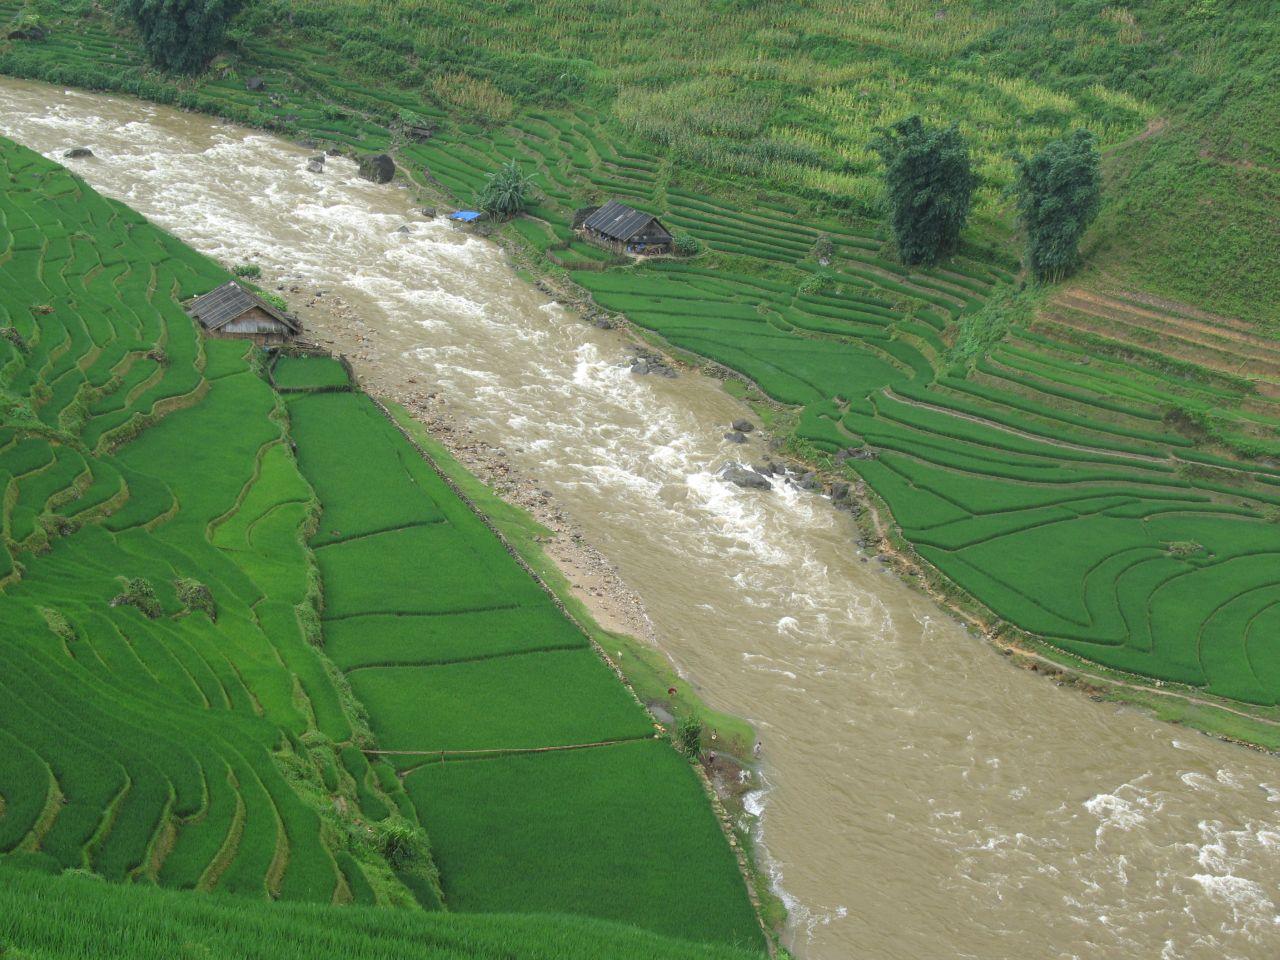 Planinska rijeka